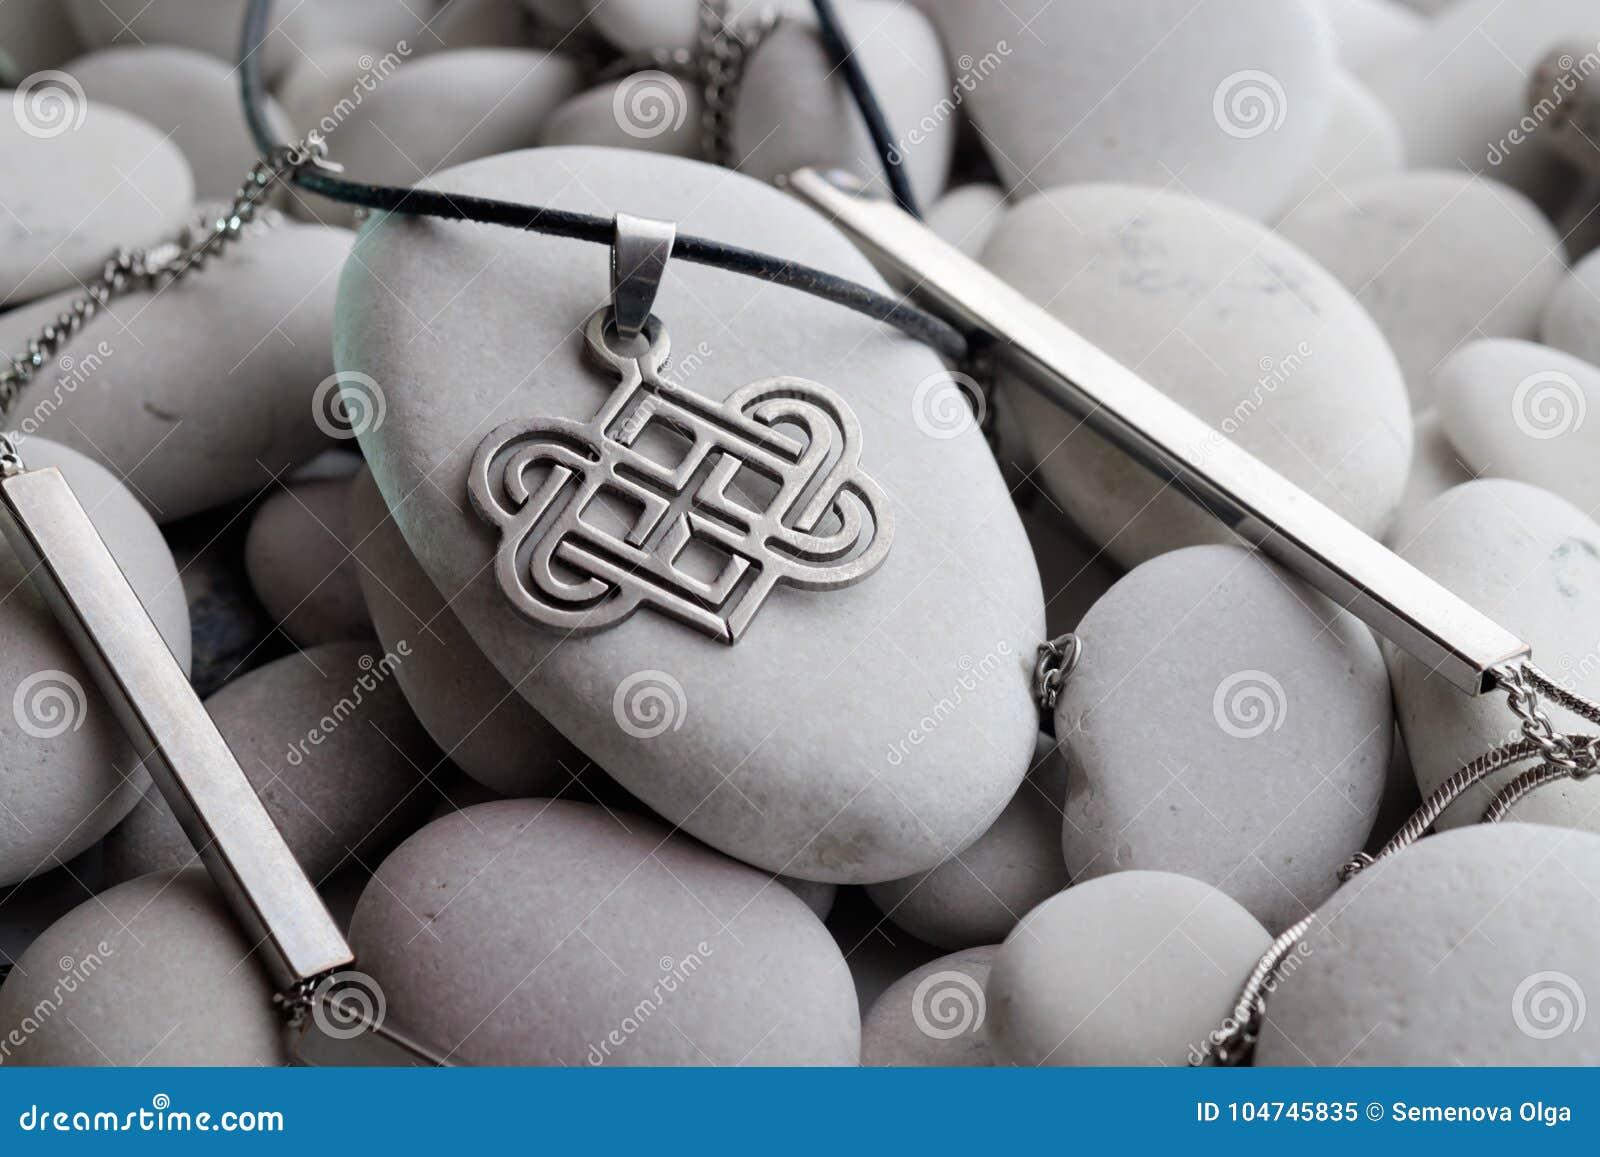 Srebna biżuteria z Celtyckimi projektami